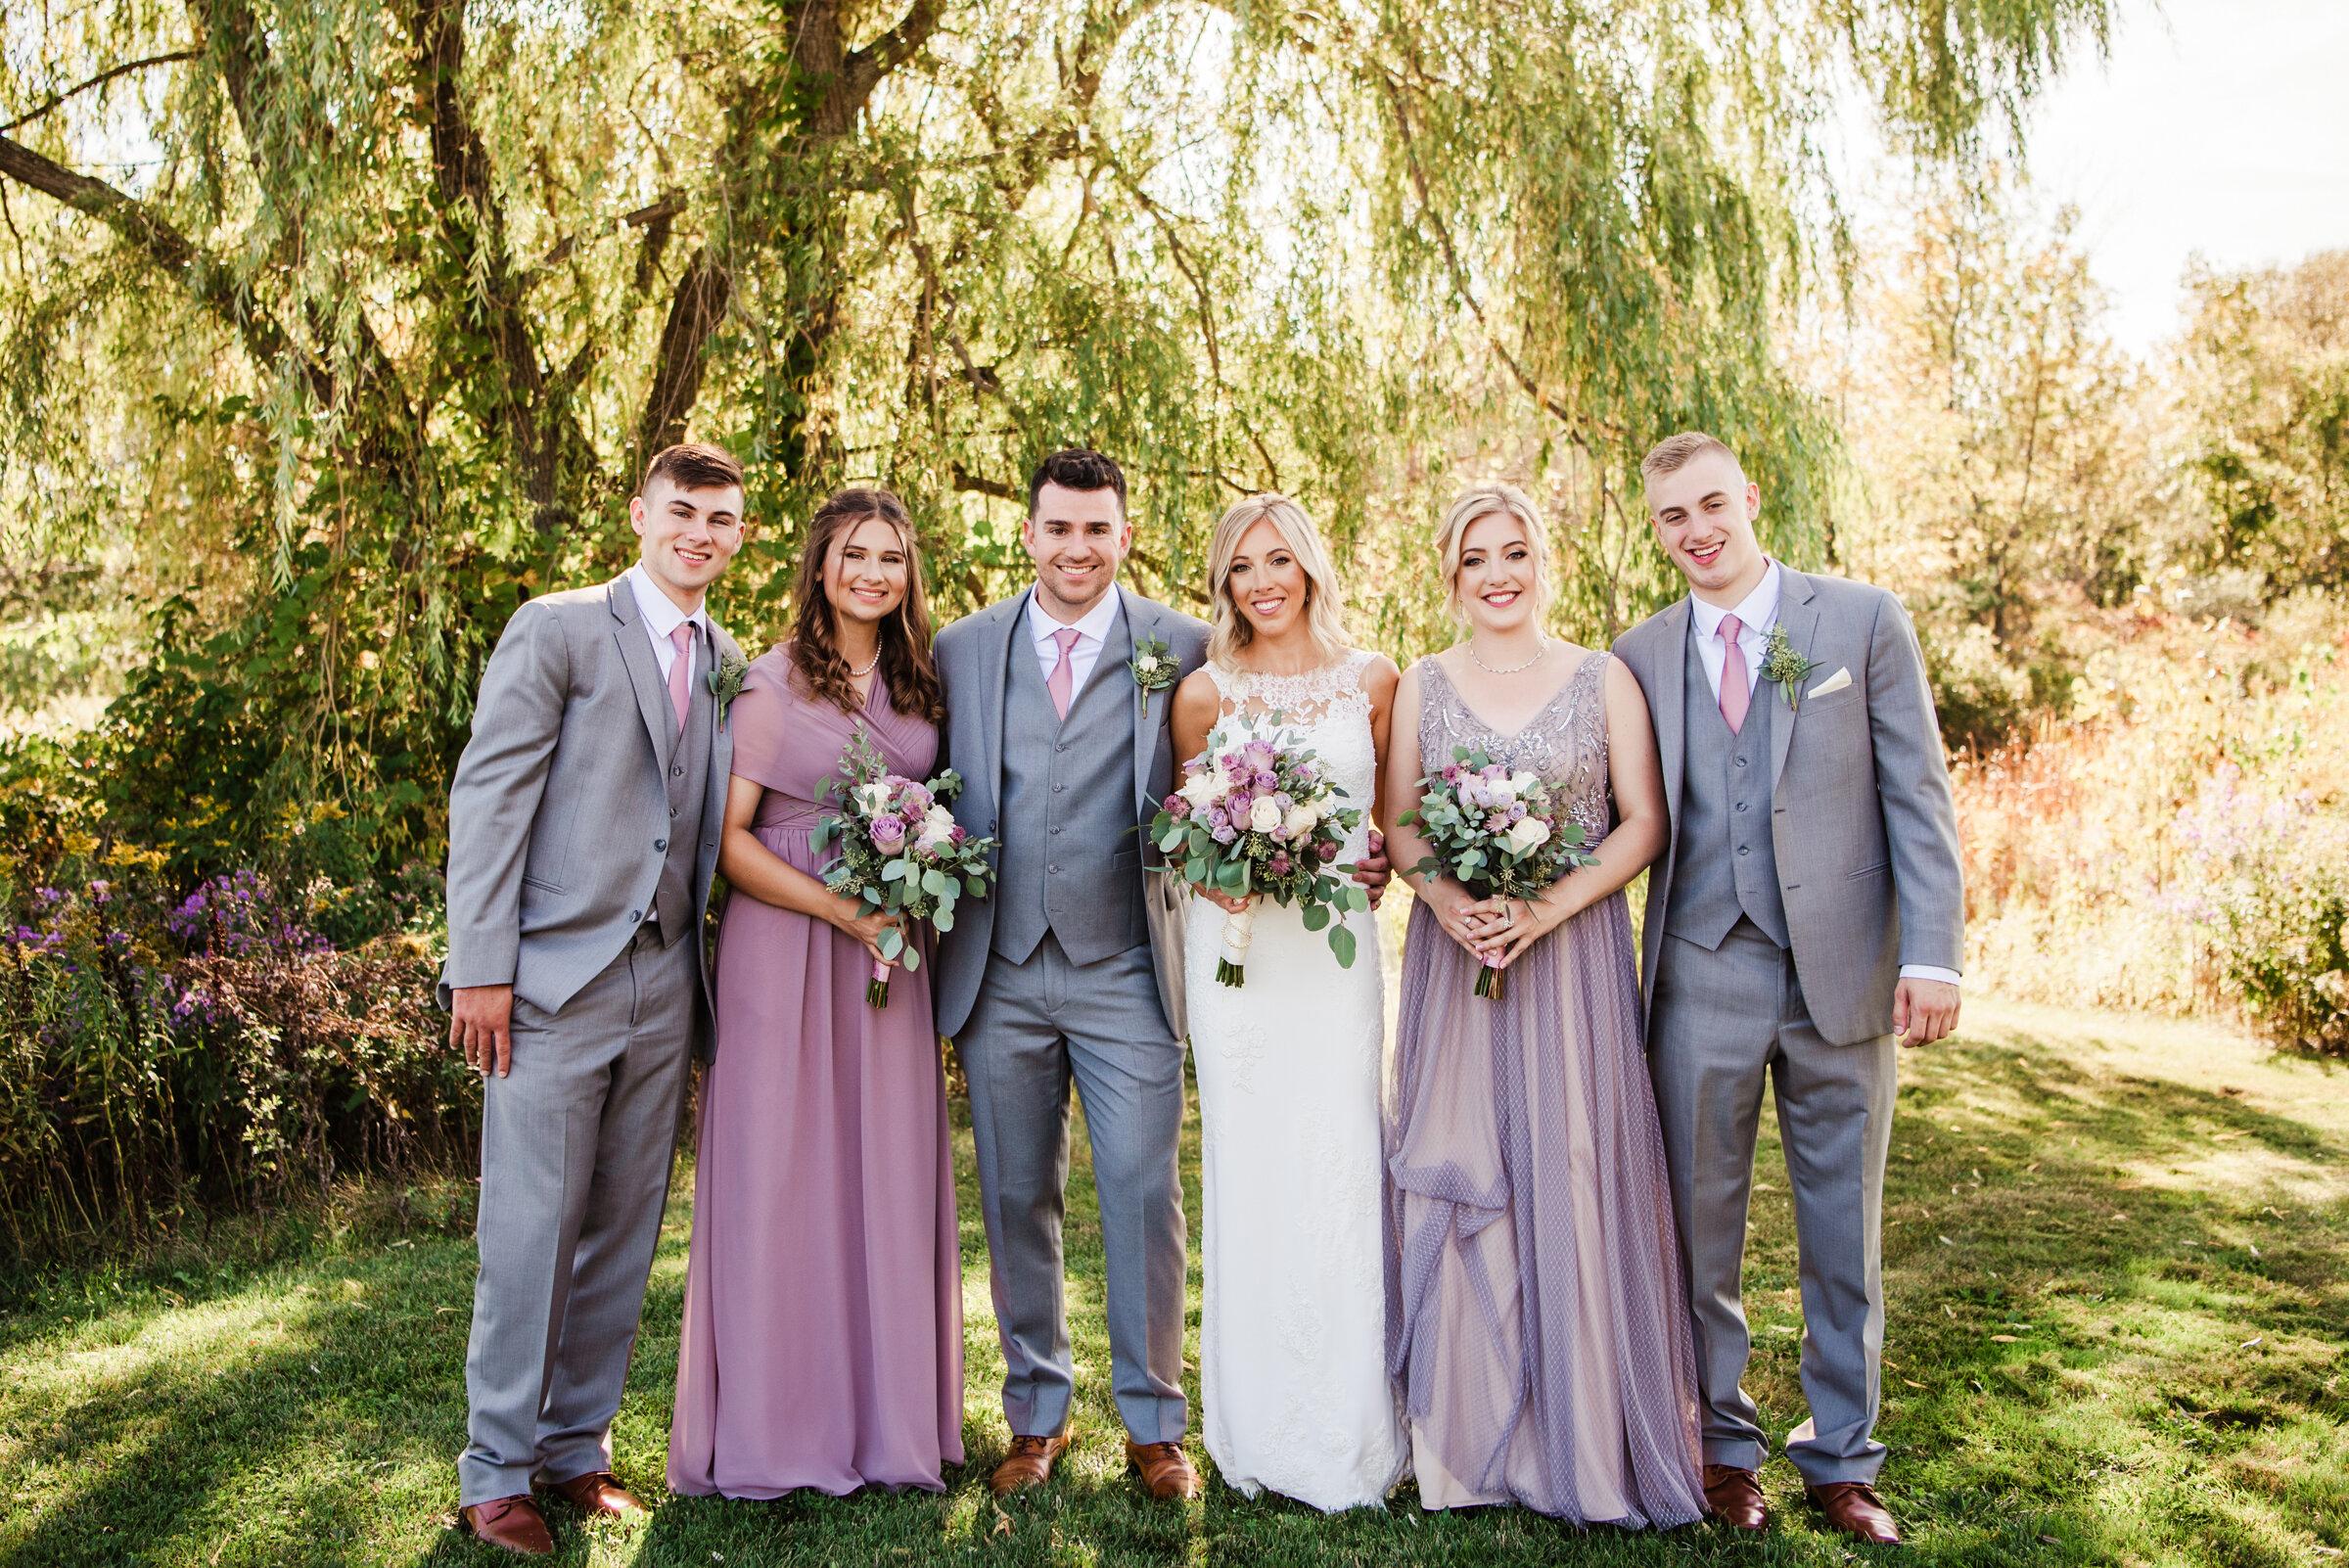 Deerfield_Country_Club_Rochester_Wedding_JILL_STUDIO_Rochester_NY_Photographer_DSC_6345.jpg